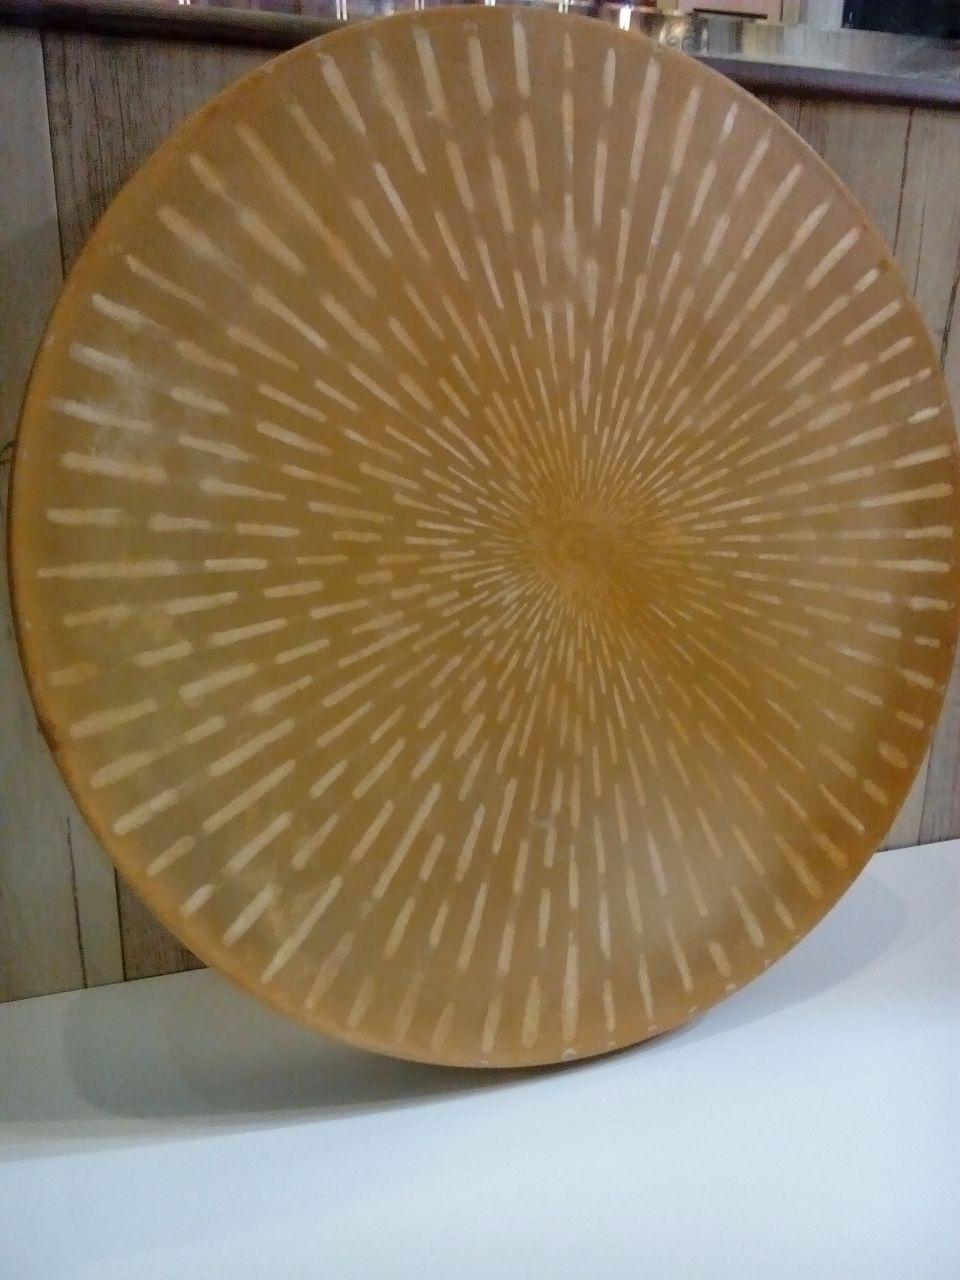 ساز دف پوستی خورشیدی باپیری